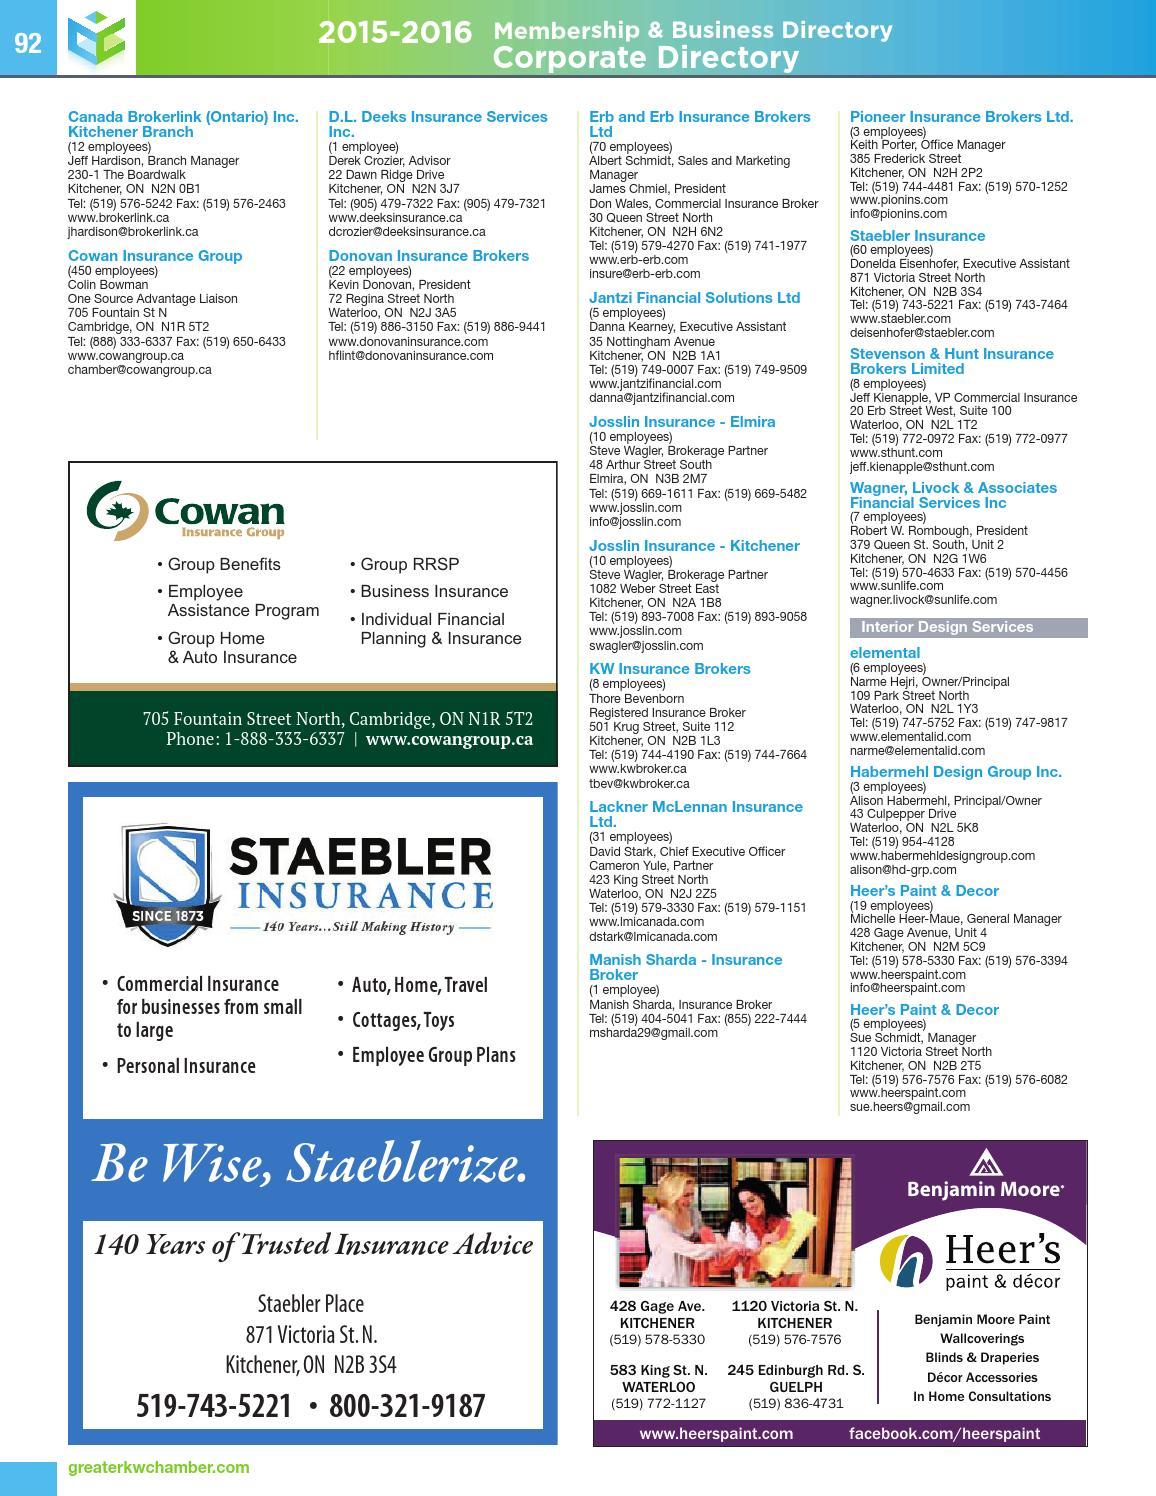 2015-16 Membership & Business Directory by Natalie Hemmerich - issuu